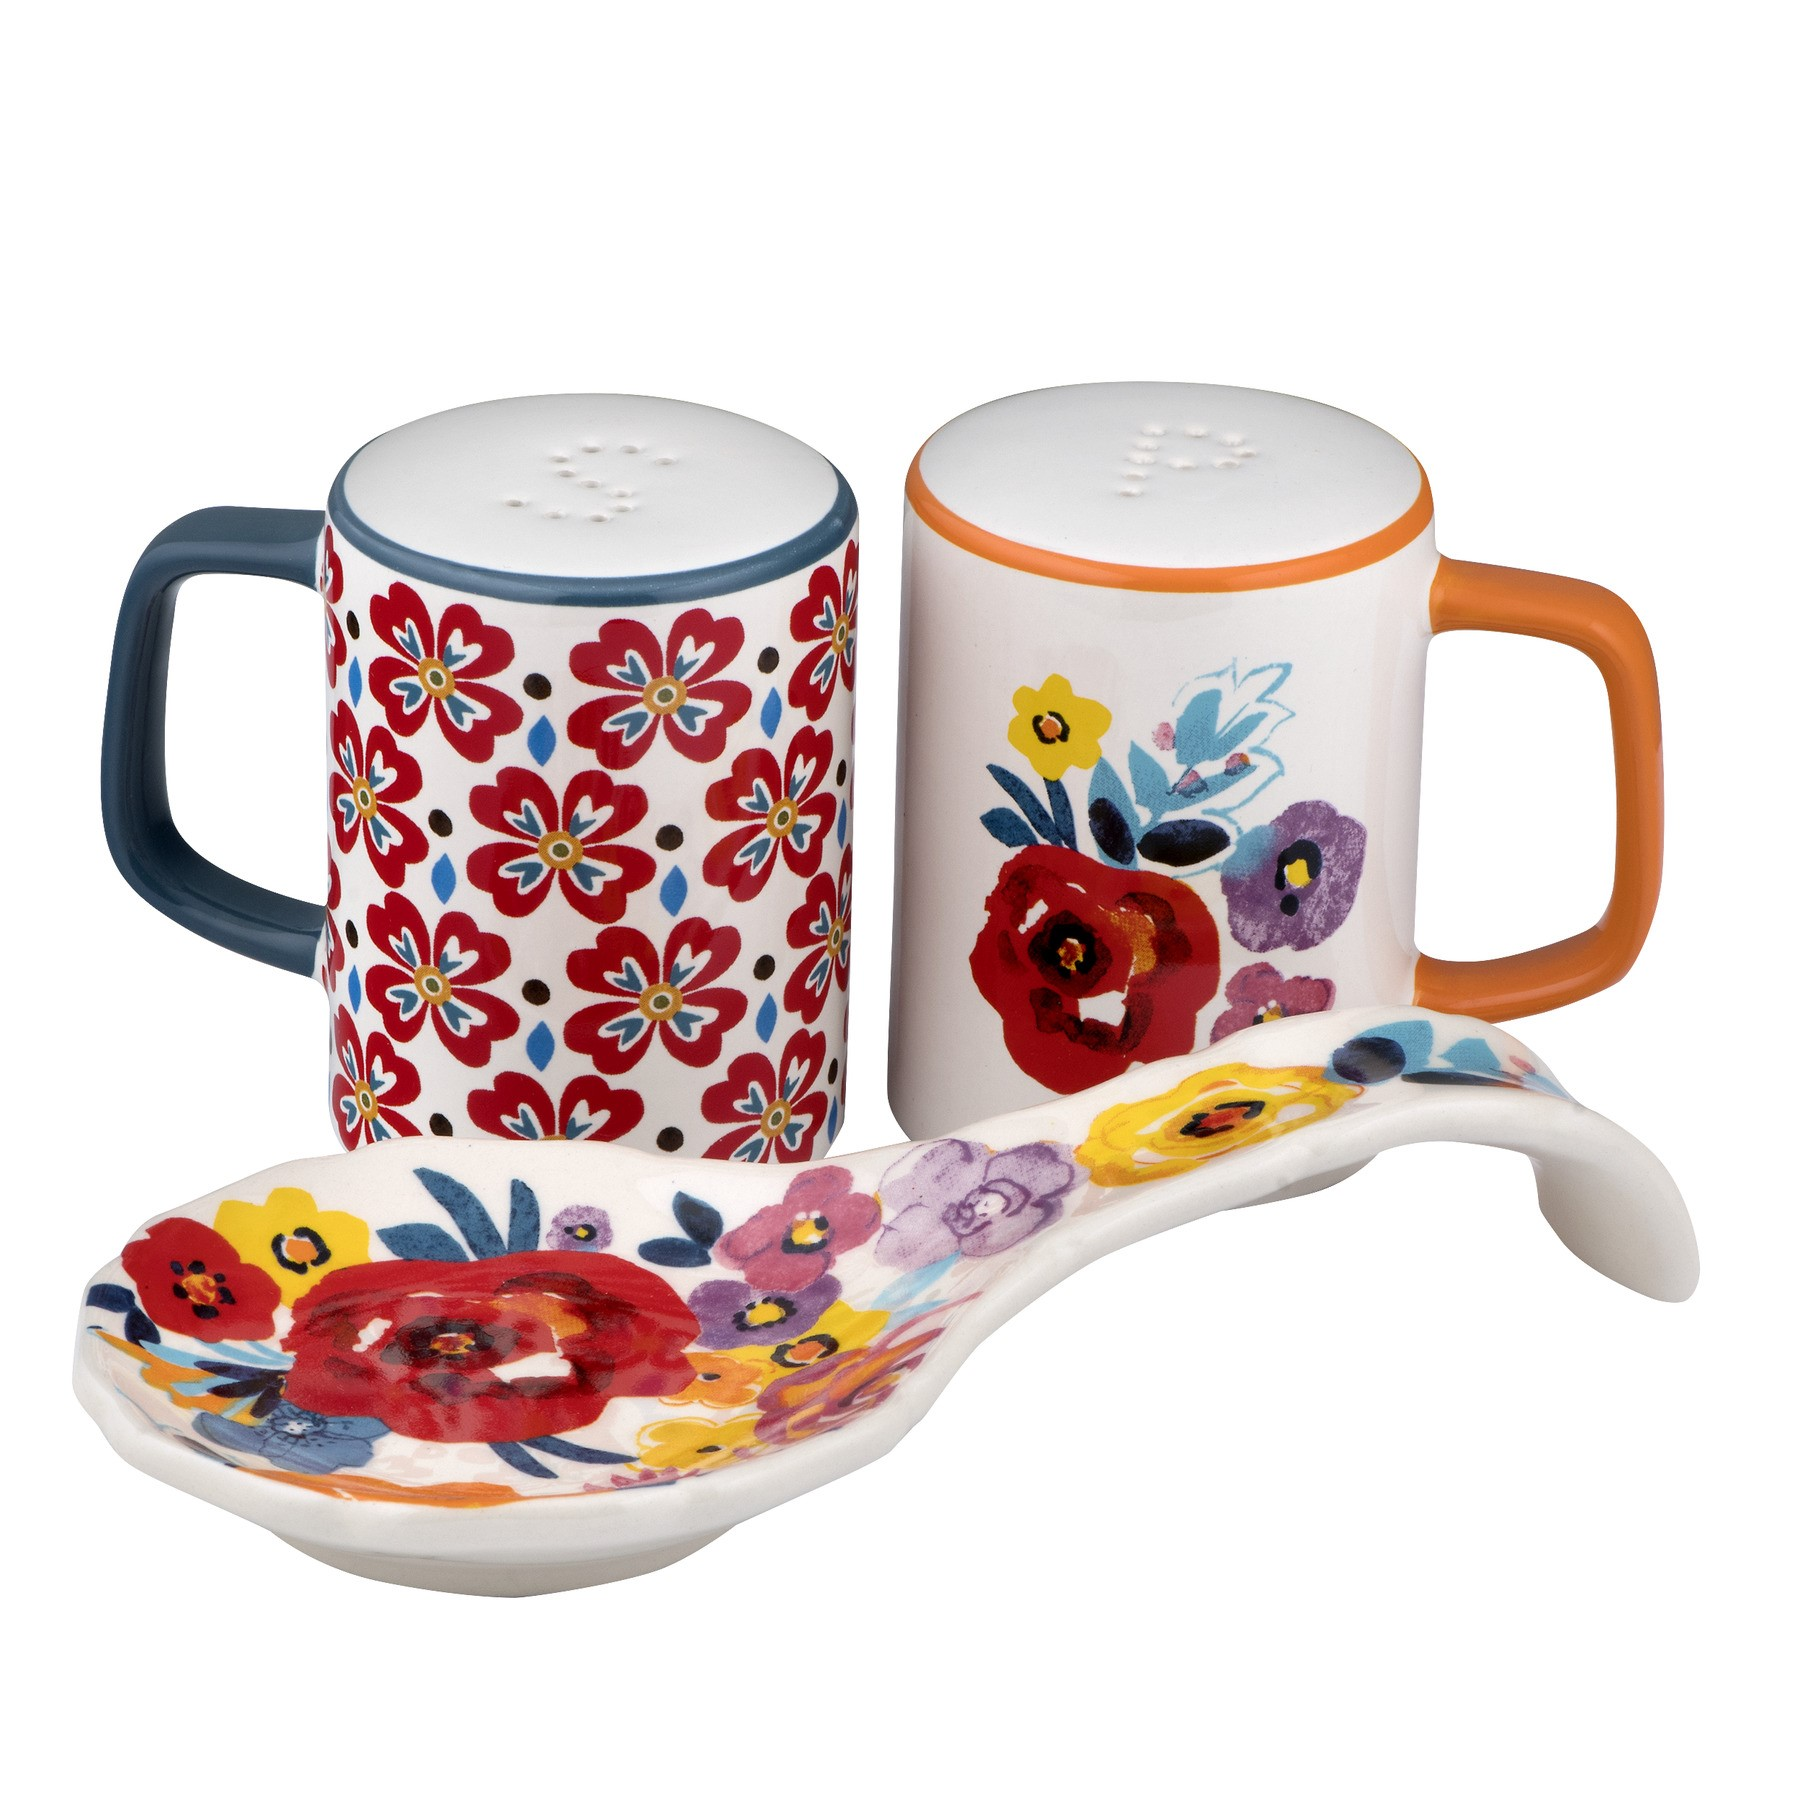 The Pioneer Woman Flea Market Floral Spoon Rest & Salt & Pepper Shakers 3 PC, 3.0 PIECE(S) by Gibson Overseas Inc